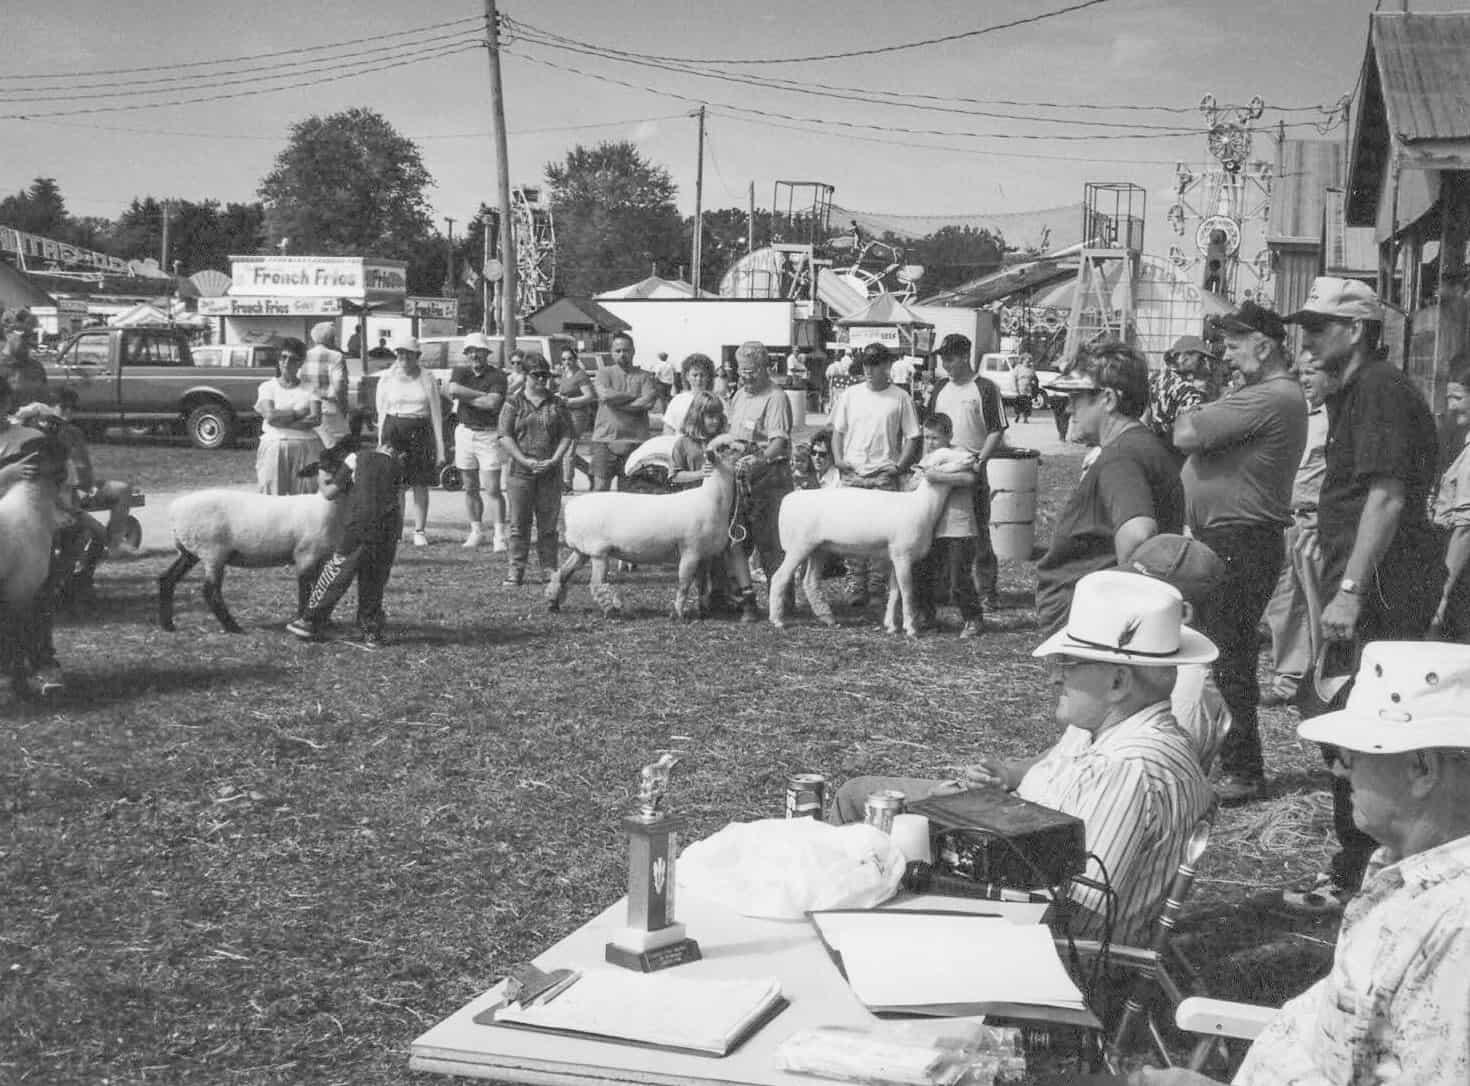 20200908-sheep show 1998